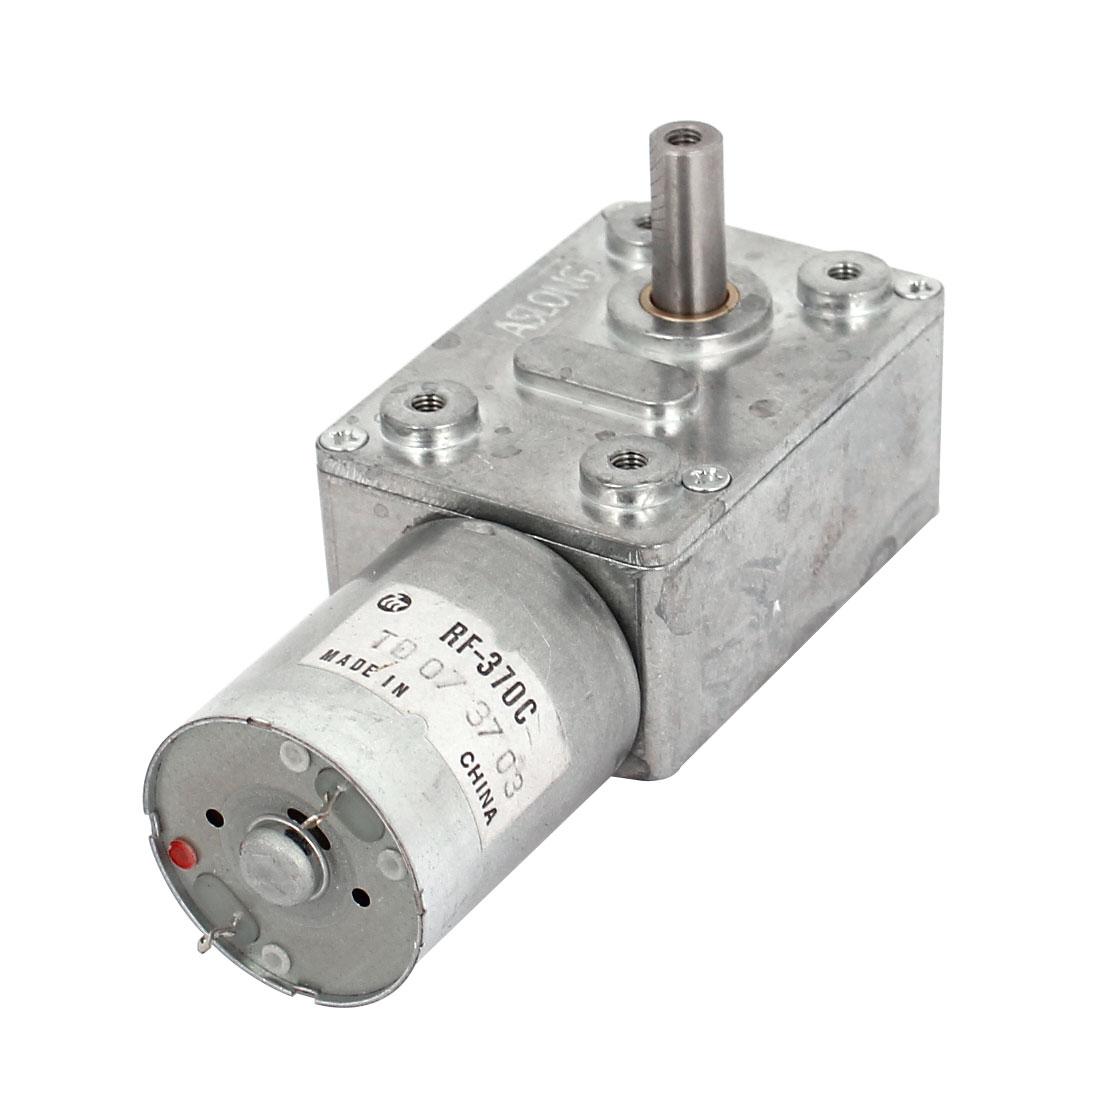 DC 12V 2 RPM 6mm Dia Shaft Speed Reduce Worm Gear Box Motor JSX1650-370